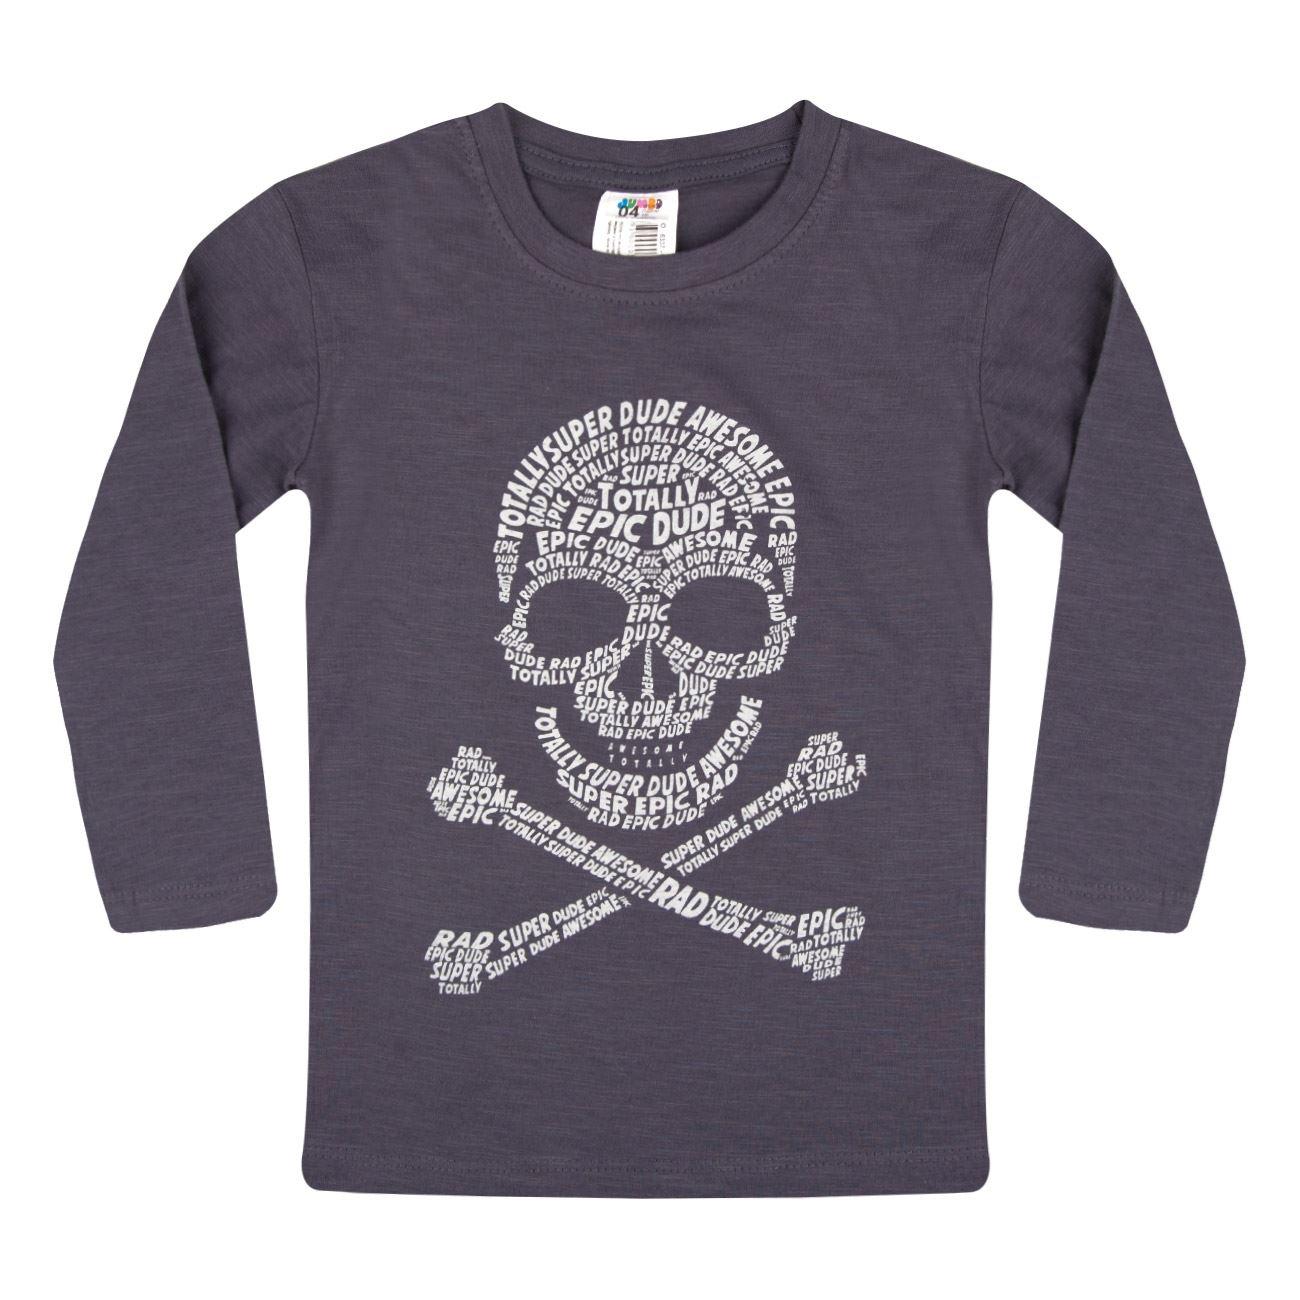 1d0bb4ee0e6b Μπλούζα Μακρυμάνικη Παιδική Μπλε Ραφ Νεκροκεφαλή   Μπλουζάκια Μακό για  Αγόρια